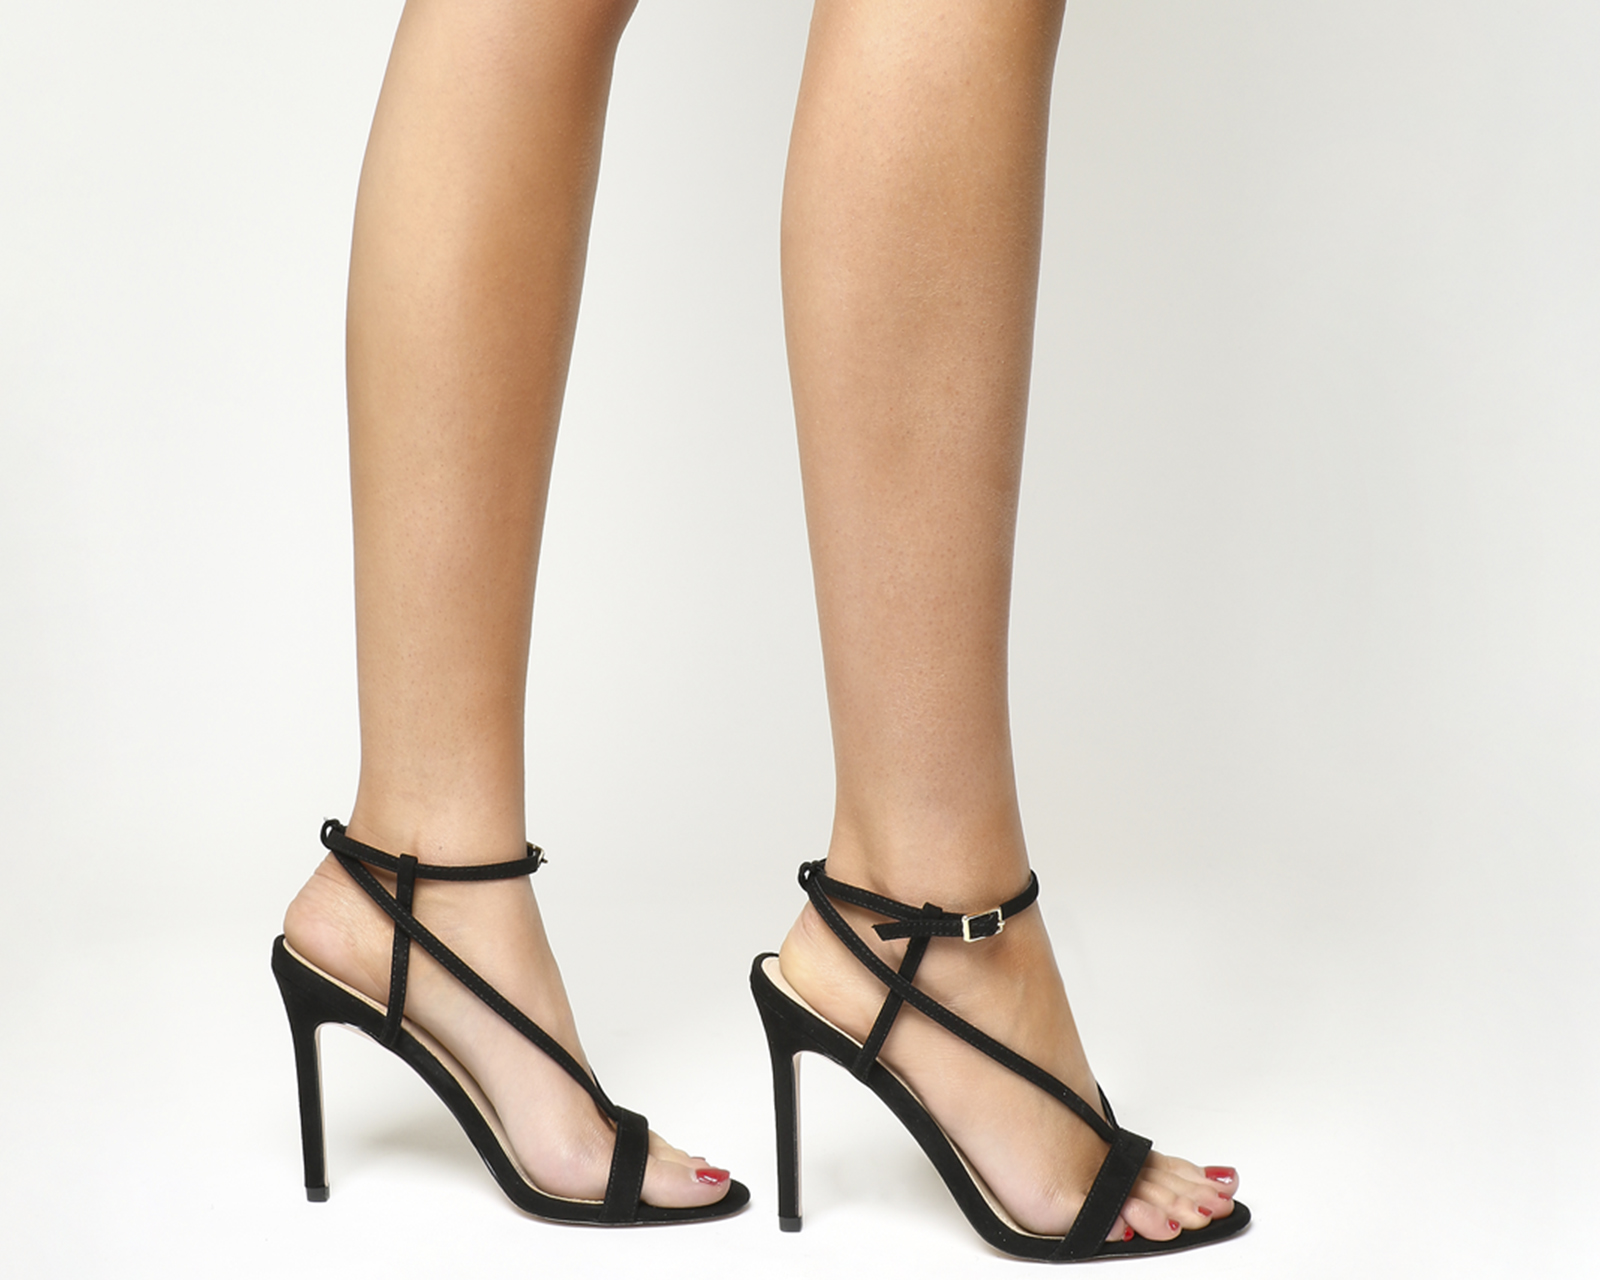 Mujer Office MARIAH punta cuadrada Sandalias De Tiras Negro Tacones